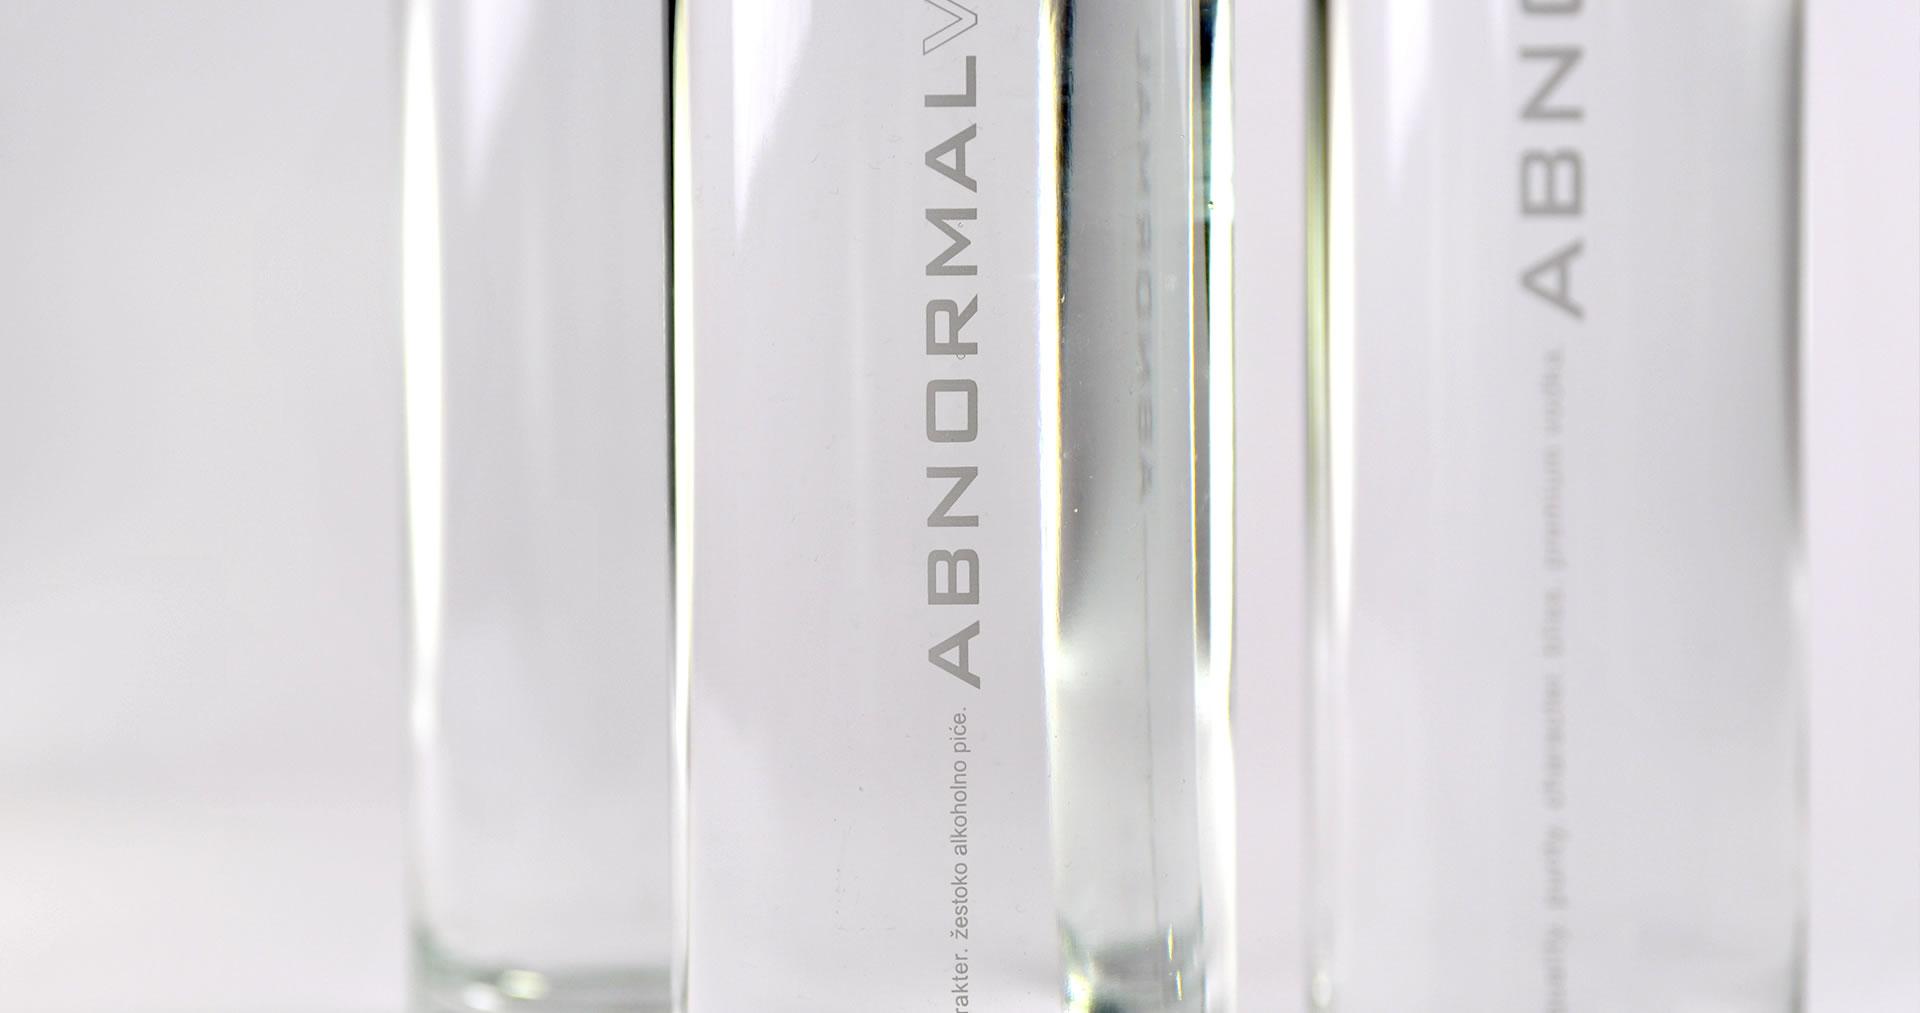 Abnormal vodka bottle label closeup